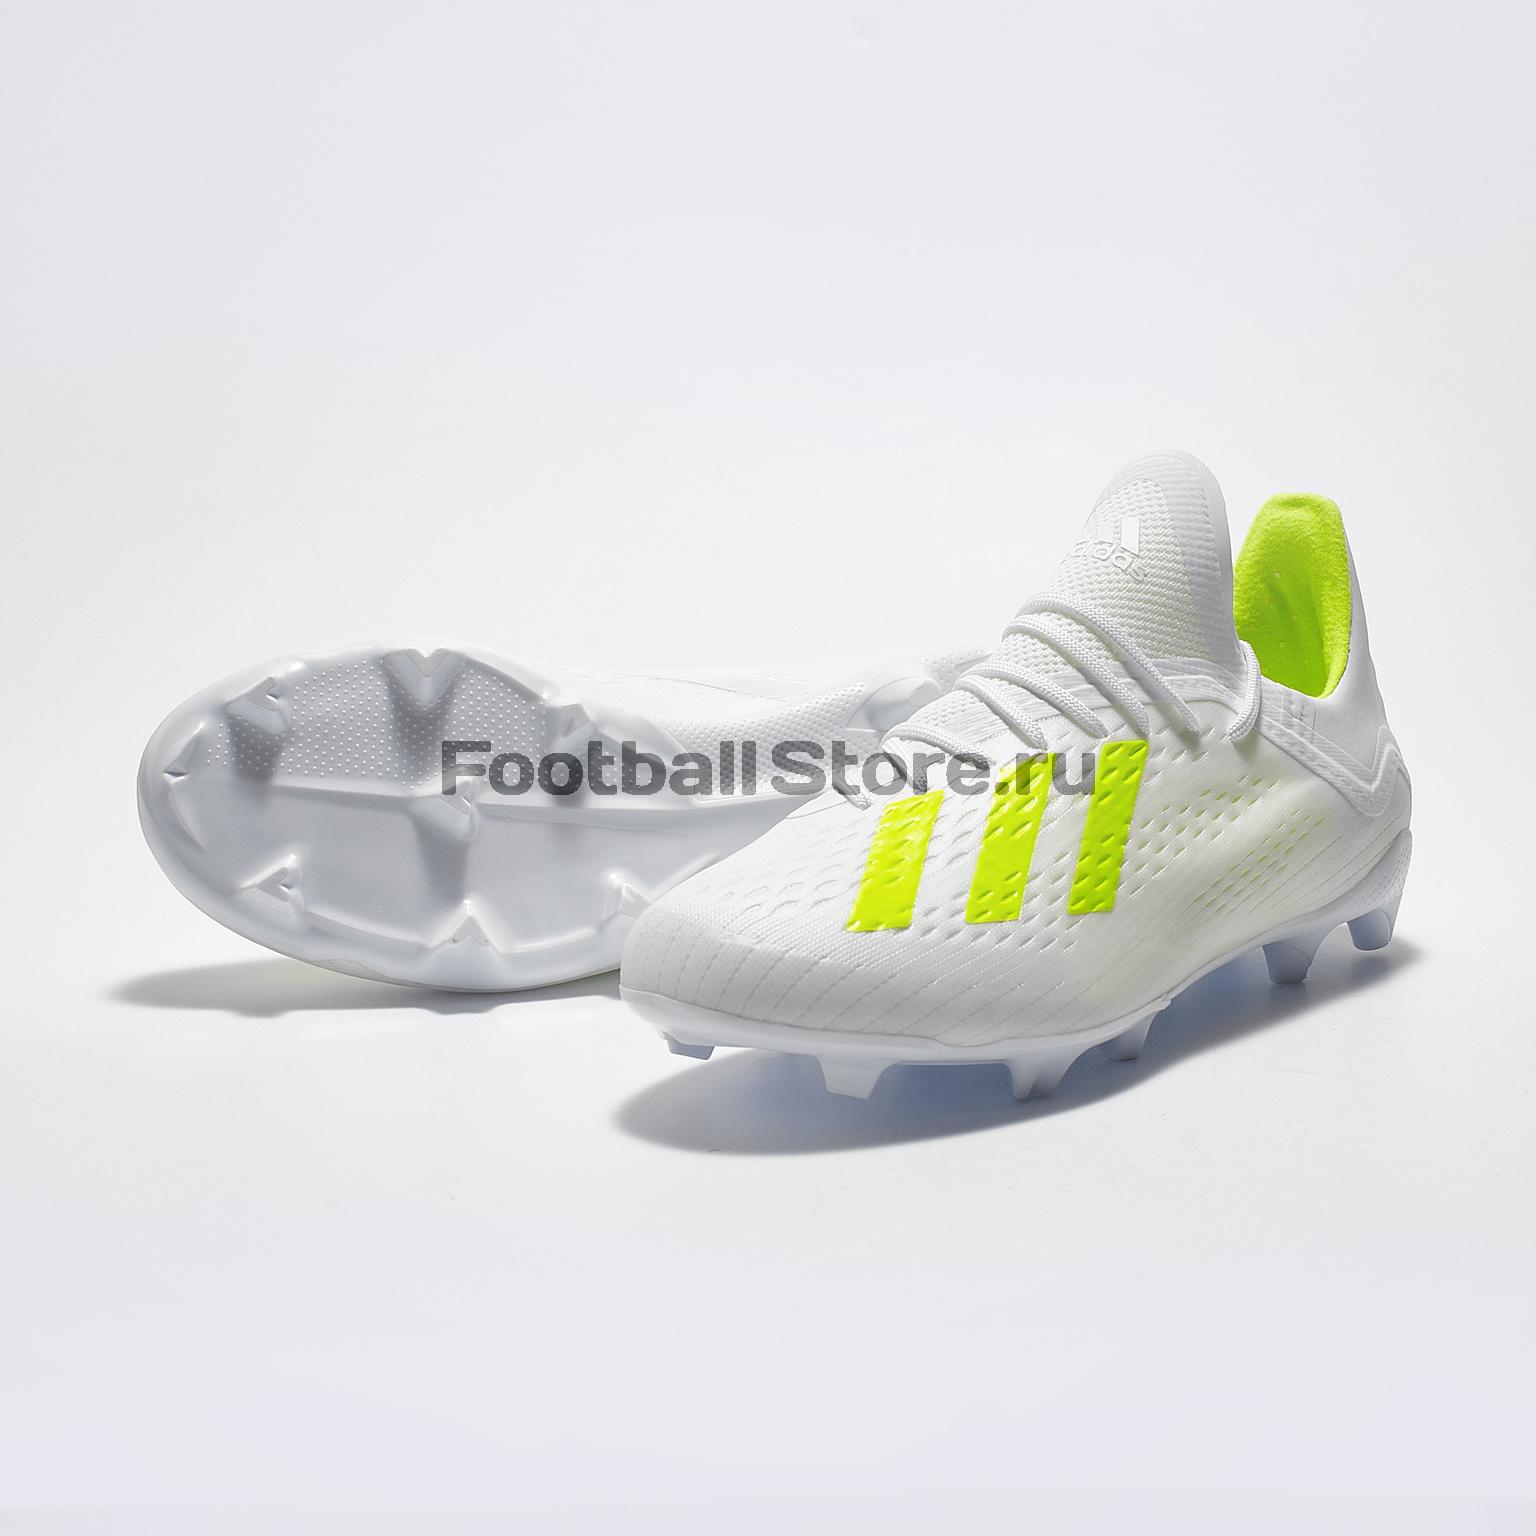 065ec31a Бутсы adidas x 18 fg bb9338 vobotecty.cf